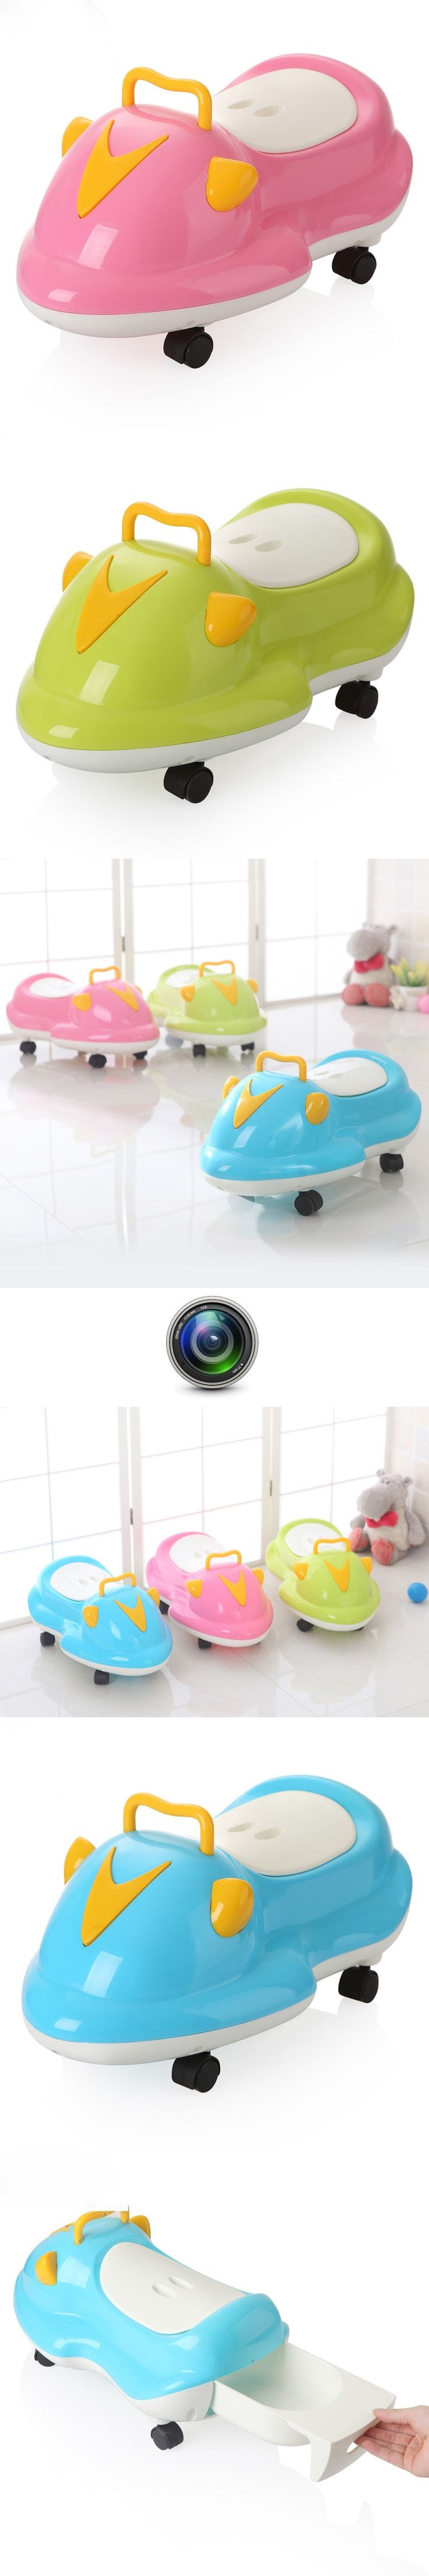 Children's Potty Plastic Lovely Car Baby Toilet Training Boy Girls Unisex Child Toilet Seat Potty Cozy Children's Pot Toilet